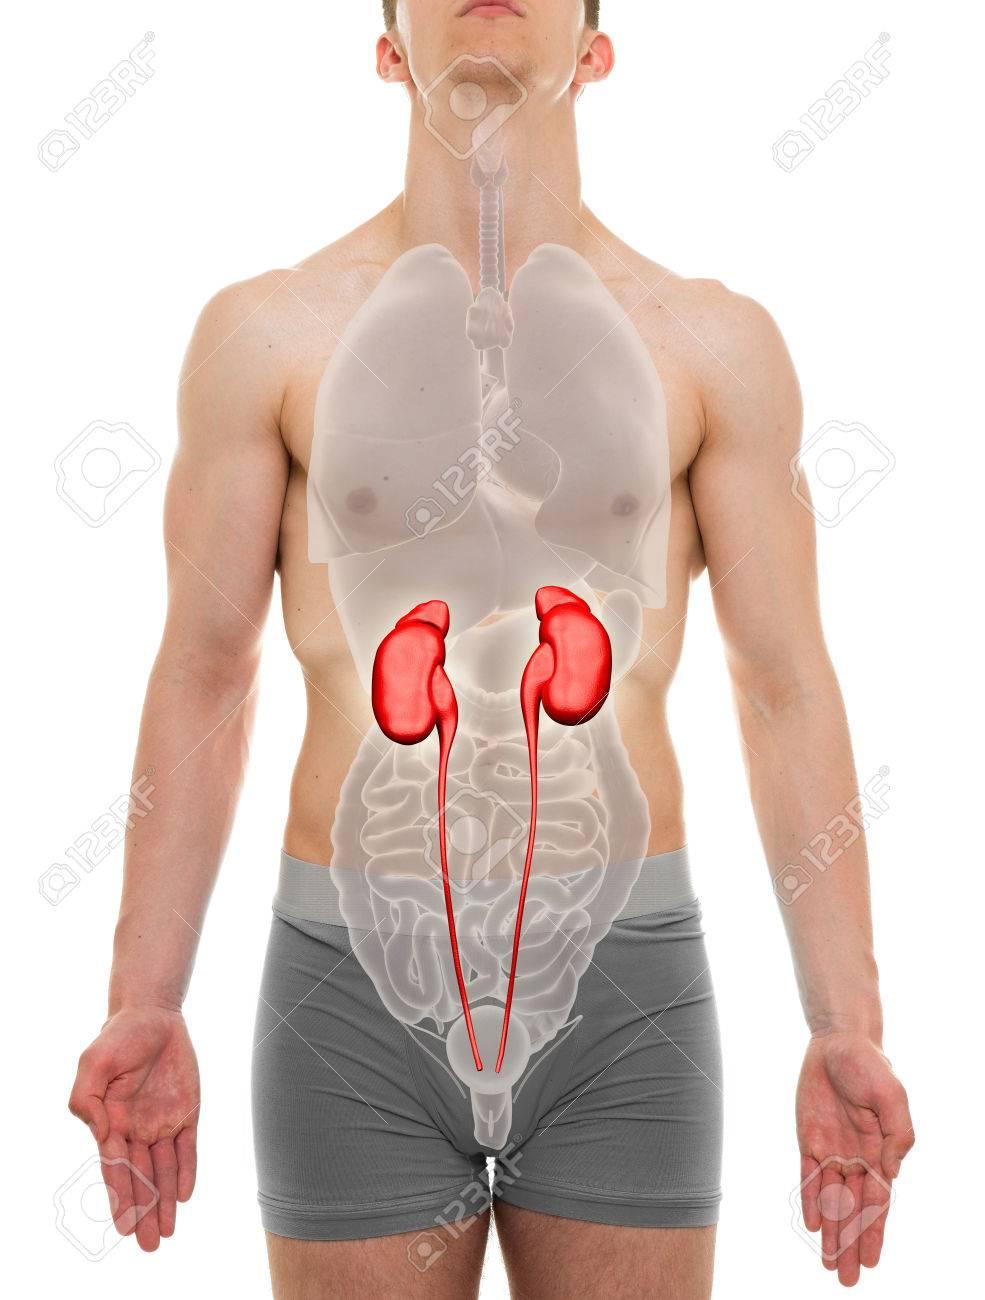 Kidneys Male Internal Organs Anatomy 3d Illustration Stock Photo